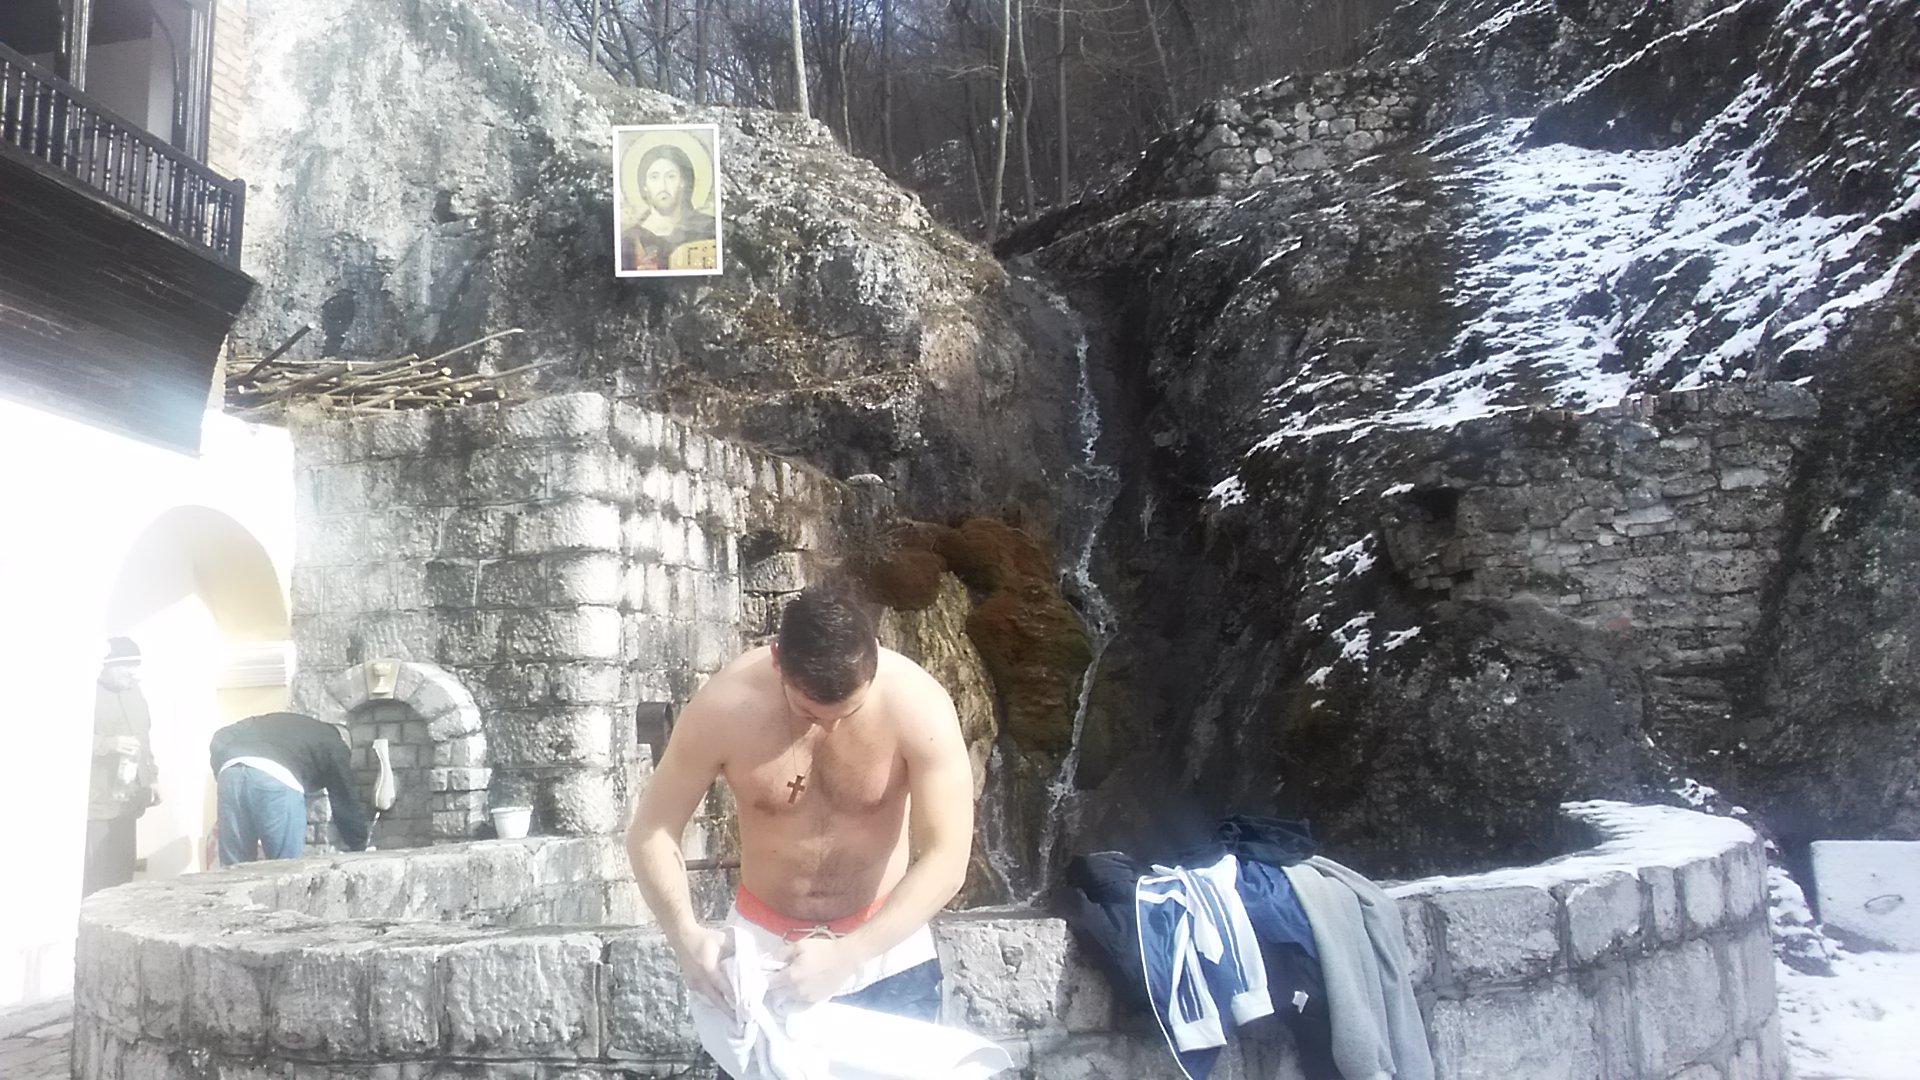 Ivan Obrenić pored jezerceta